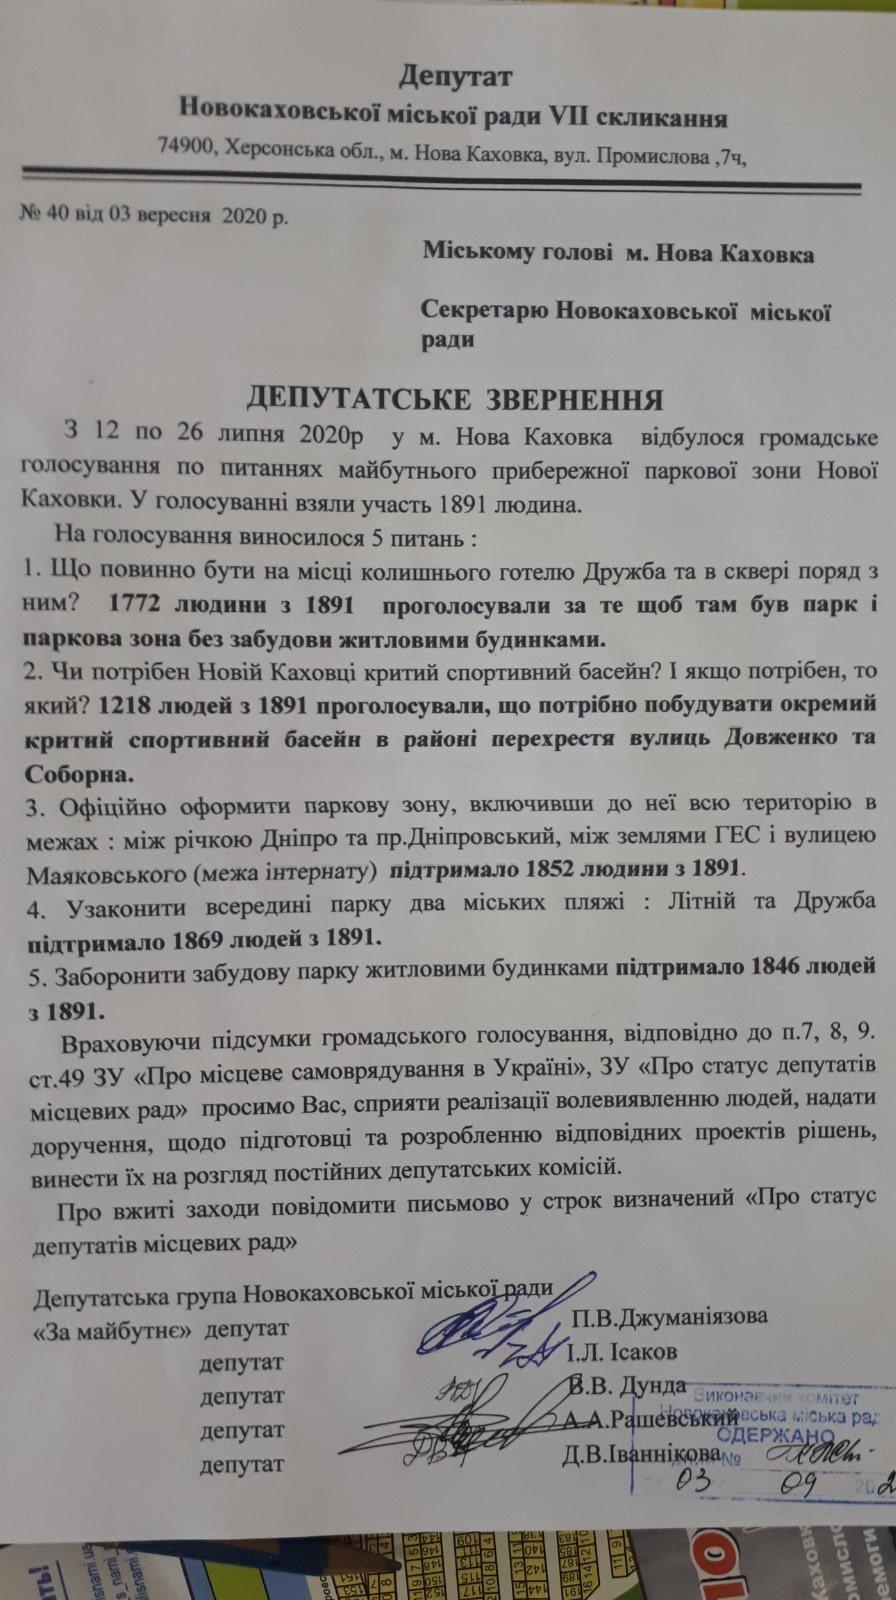 Депутатам городского совета «ЗА МАЙБУТНЄ» угрожают